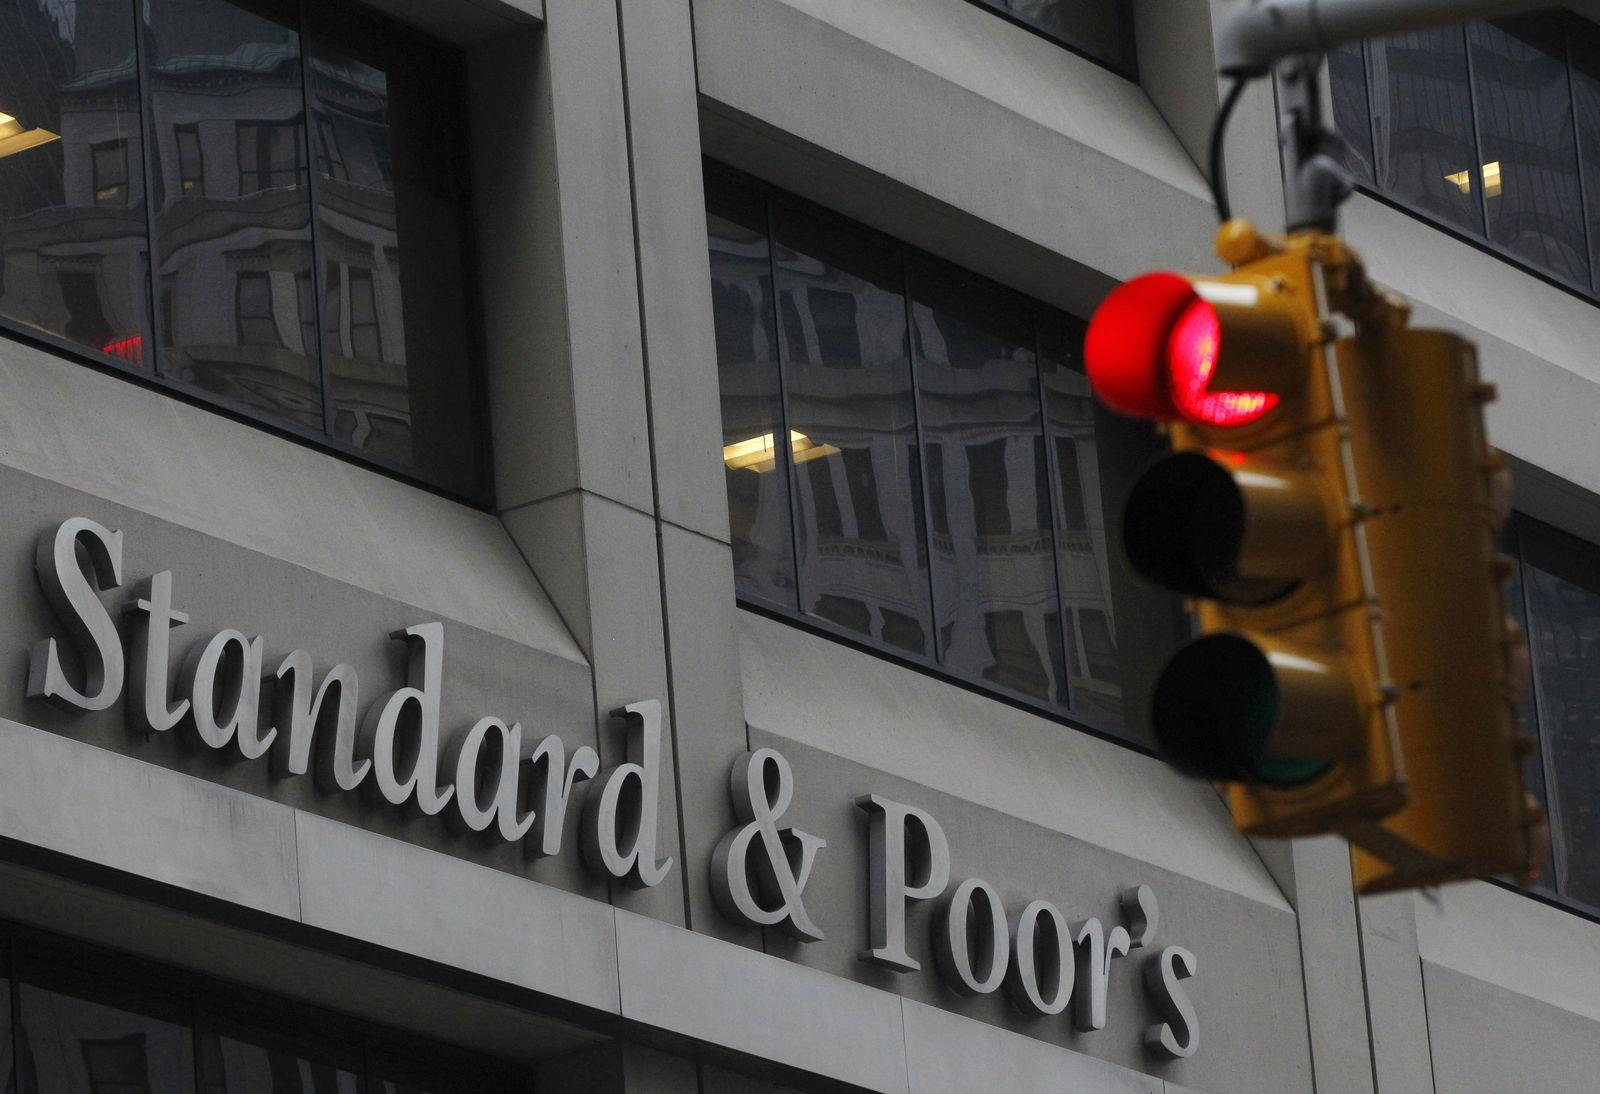 Standard & poors / S&P